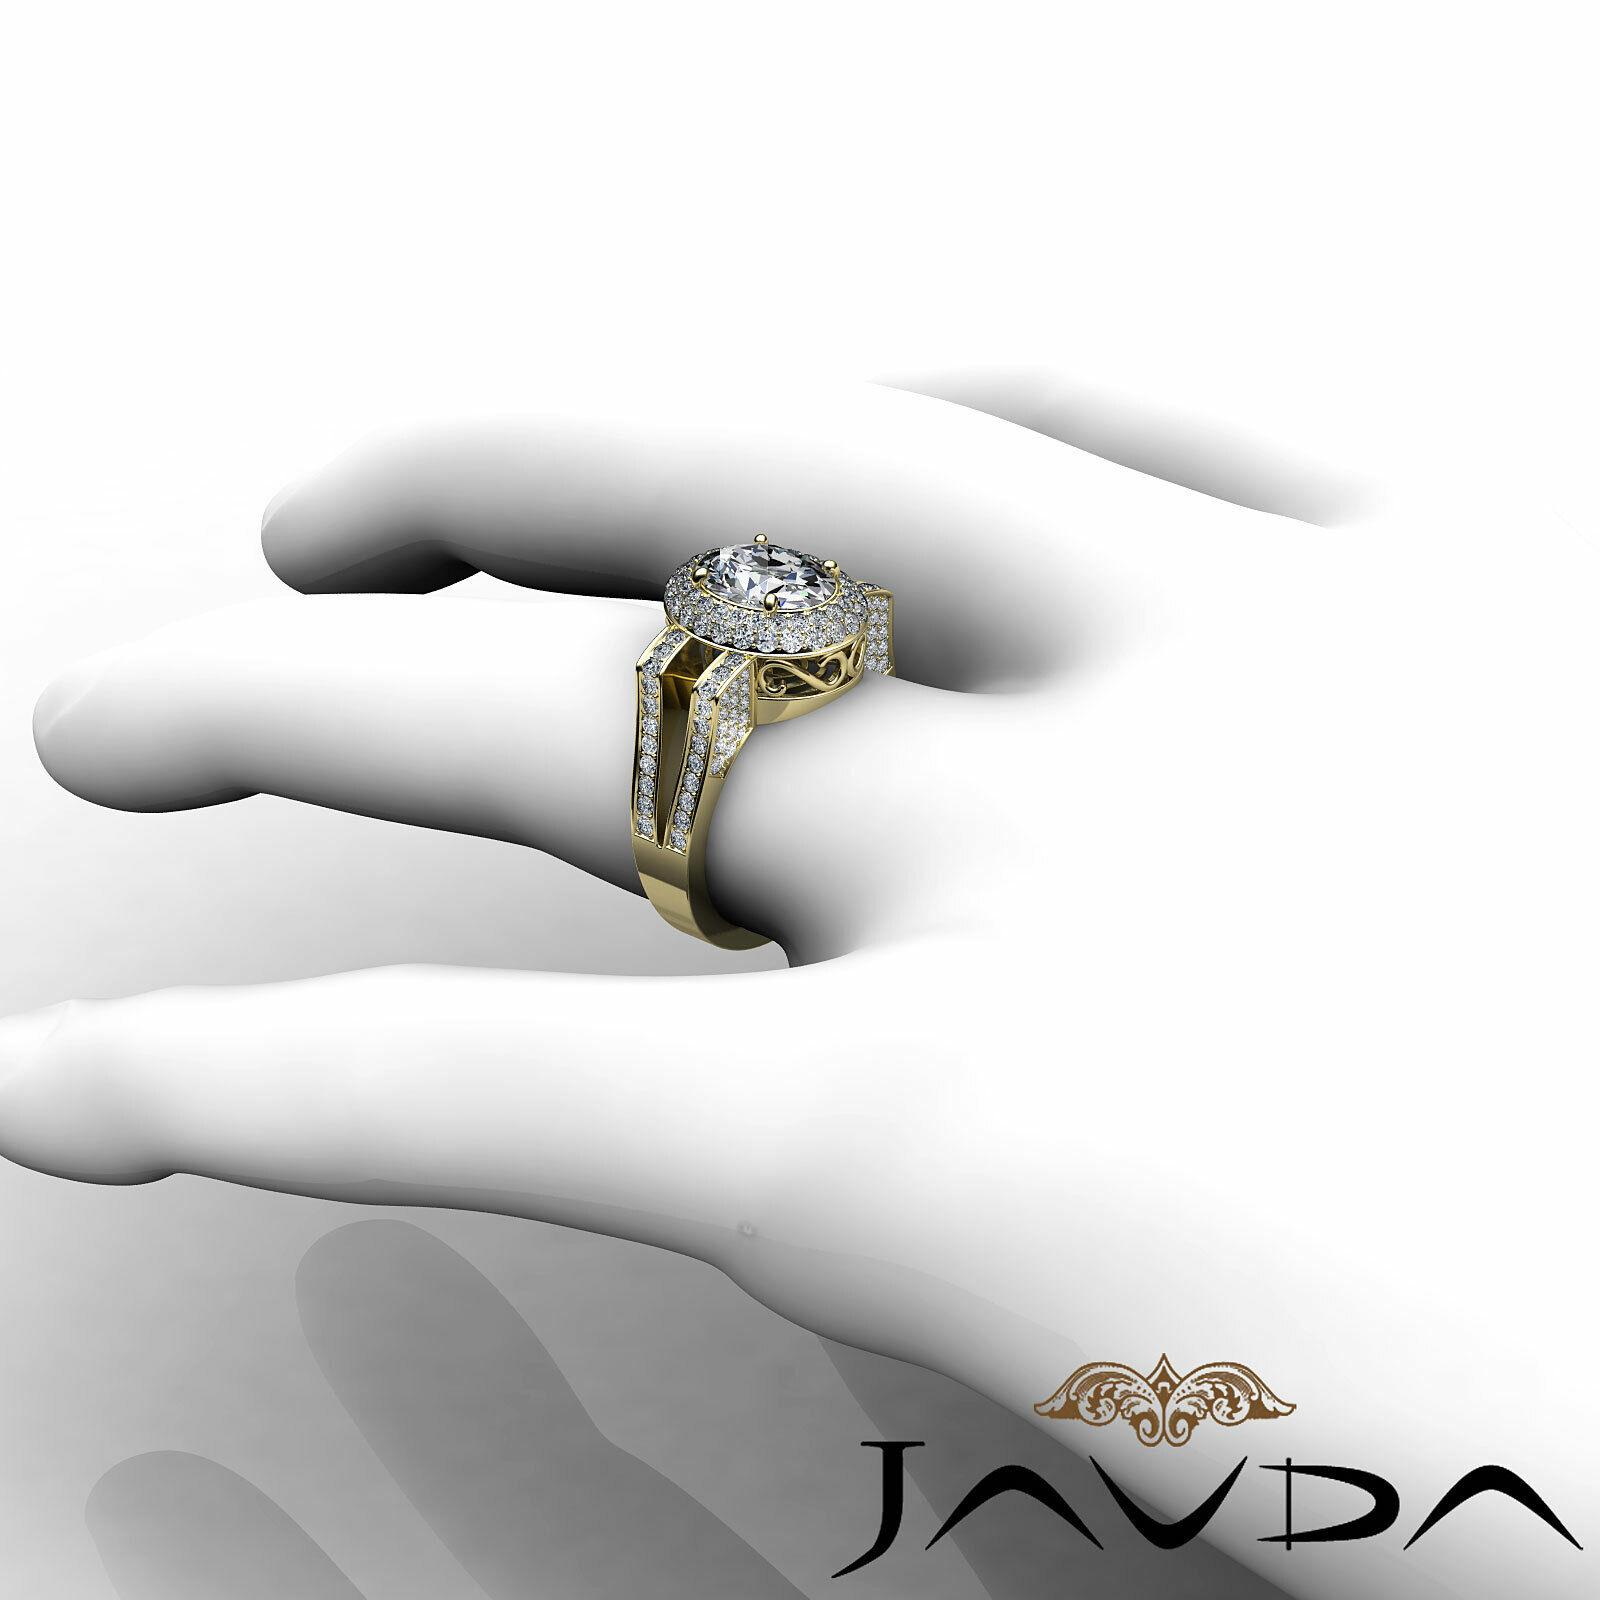 1.9ctw Gala Halo Split Shank Oval Diamond Engagement Ring GIA E-VS2 White Gold 11